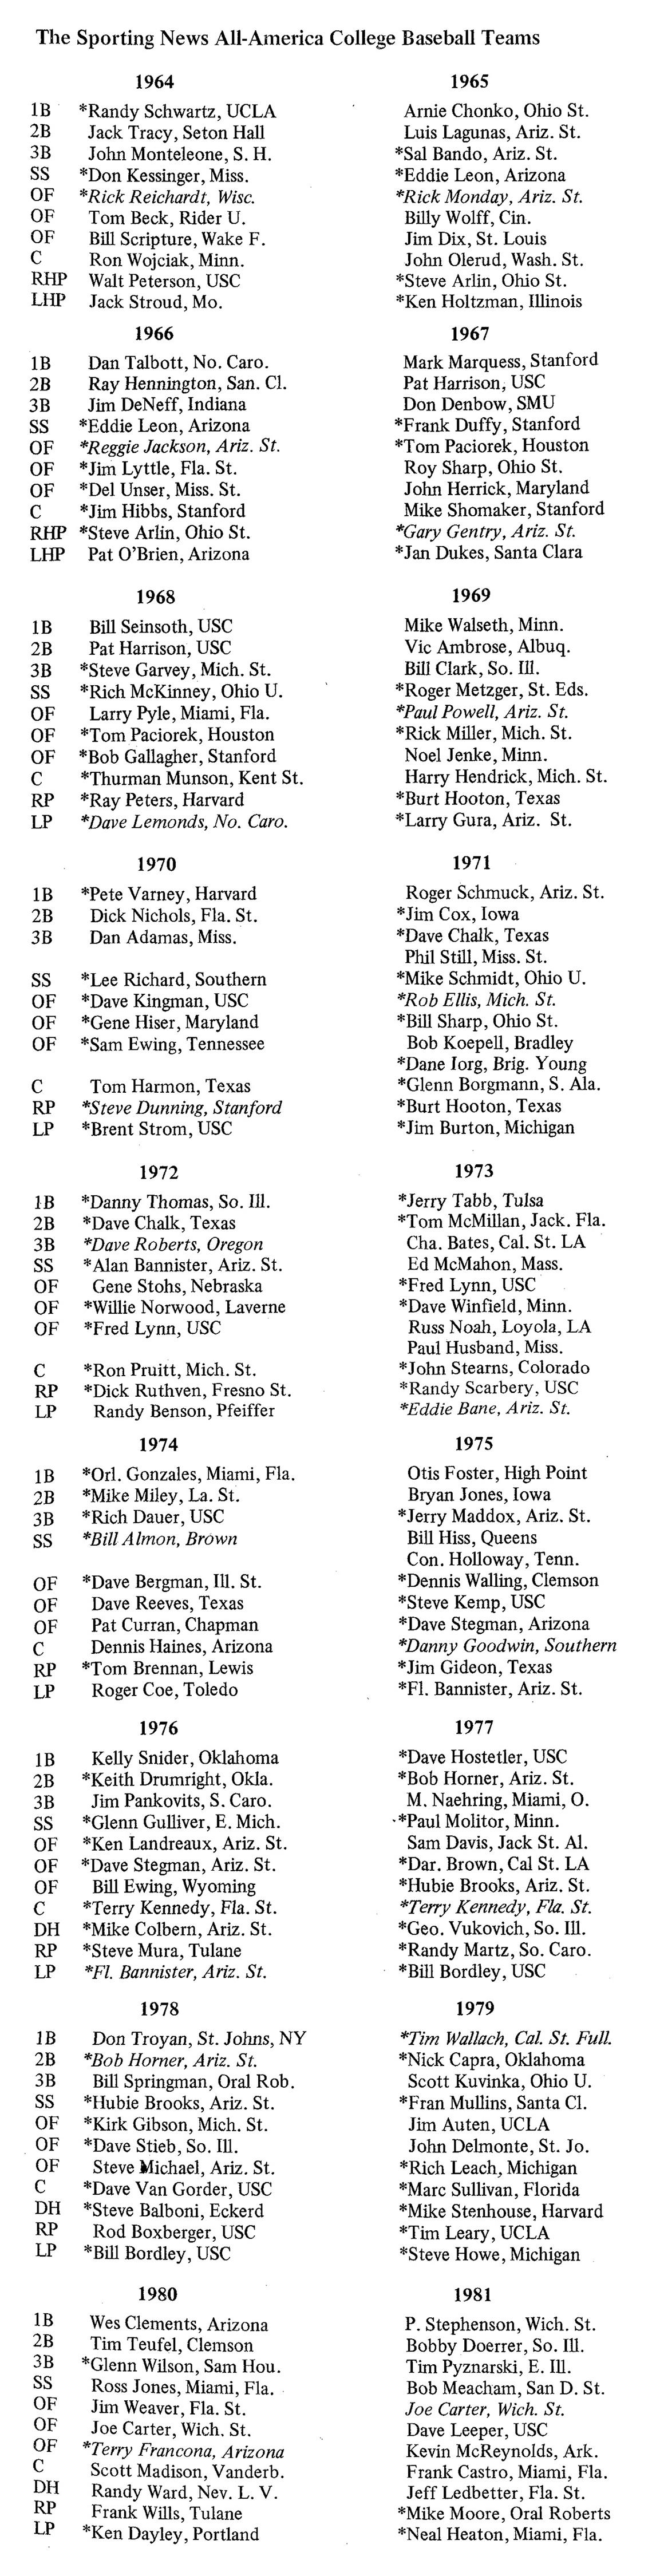 TSN All-America Teams, 1964-1981